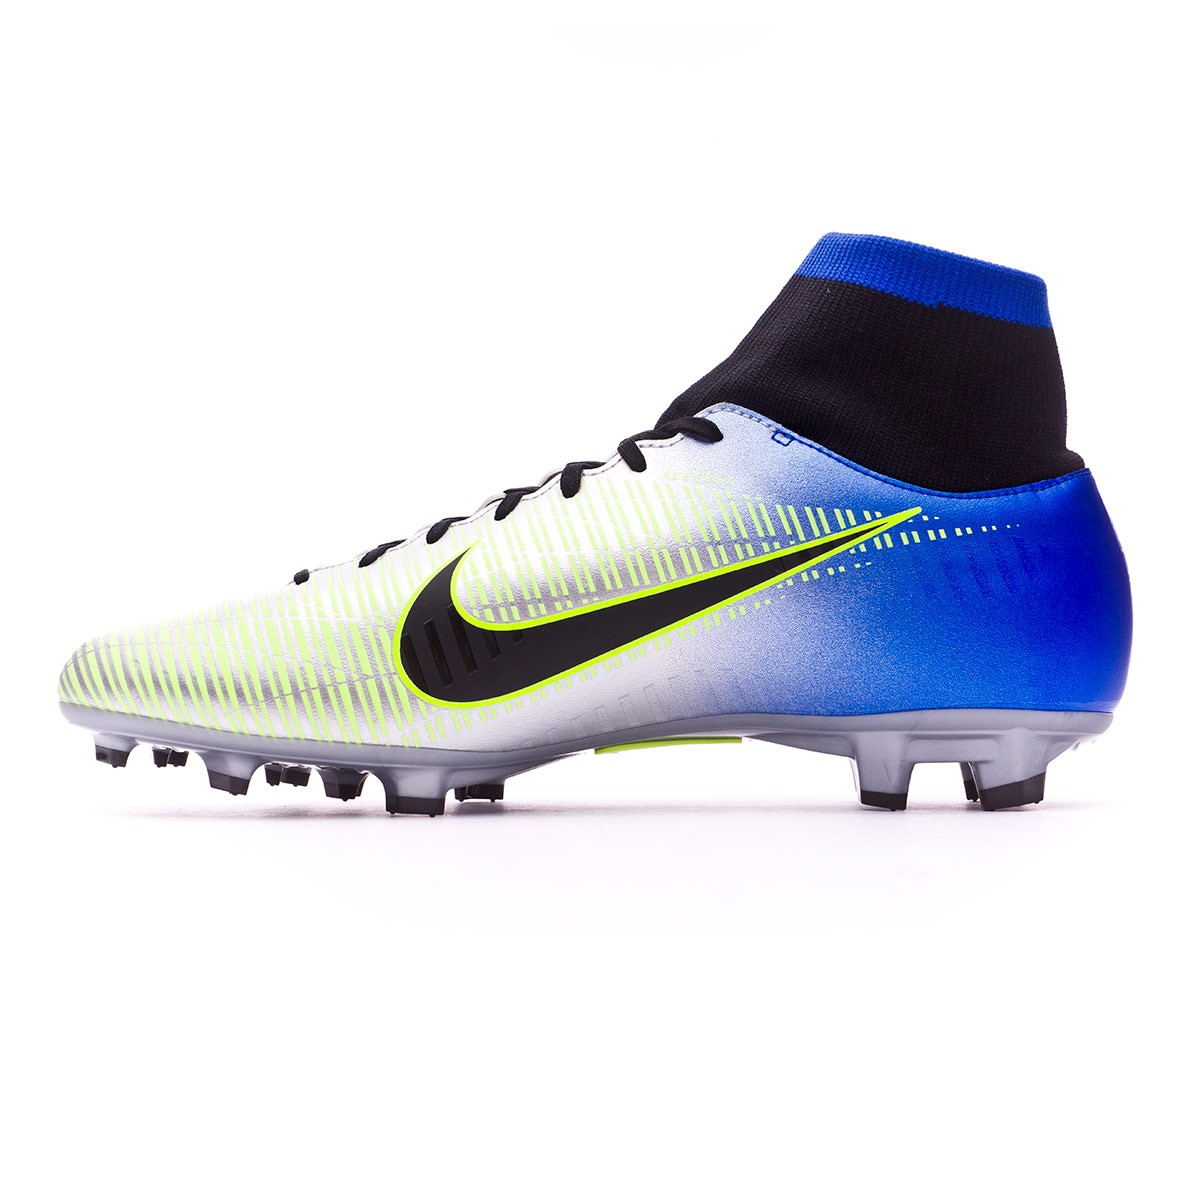 d370e4599797 Football Boots Nike Mercurial Victory VI DF FG Neymar Racer  blue-Black-Chrome-Volt - Football store Fútbol Emotion